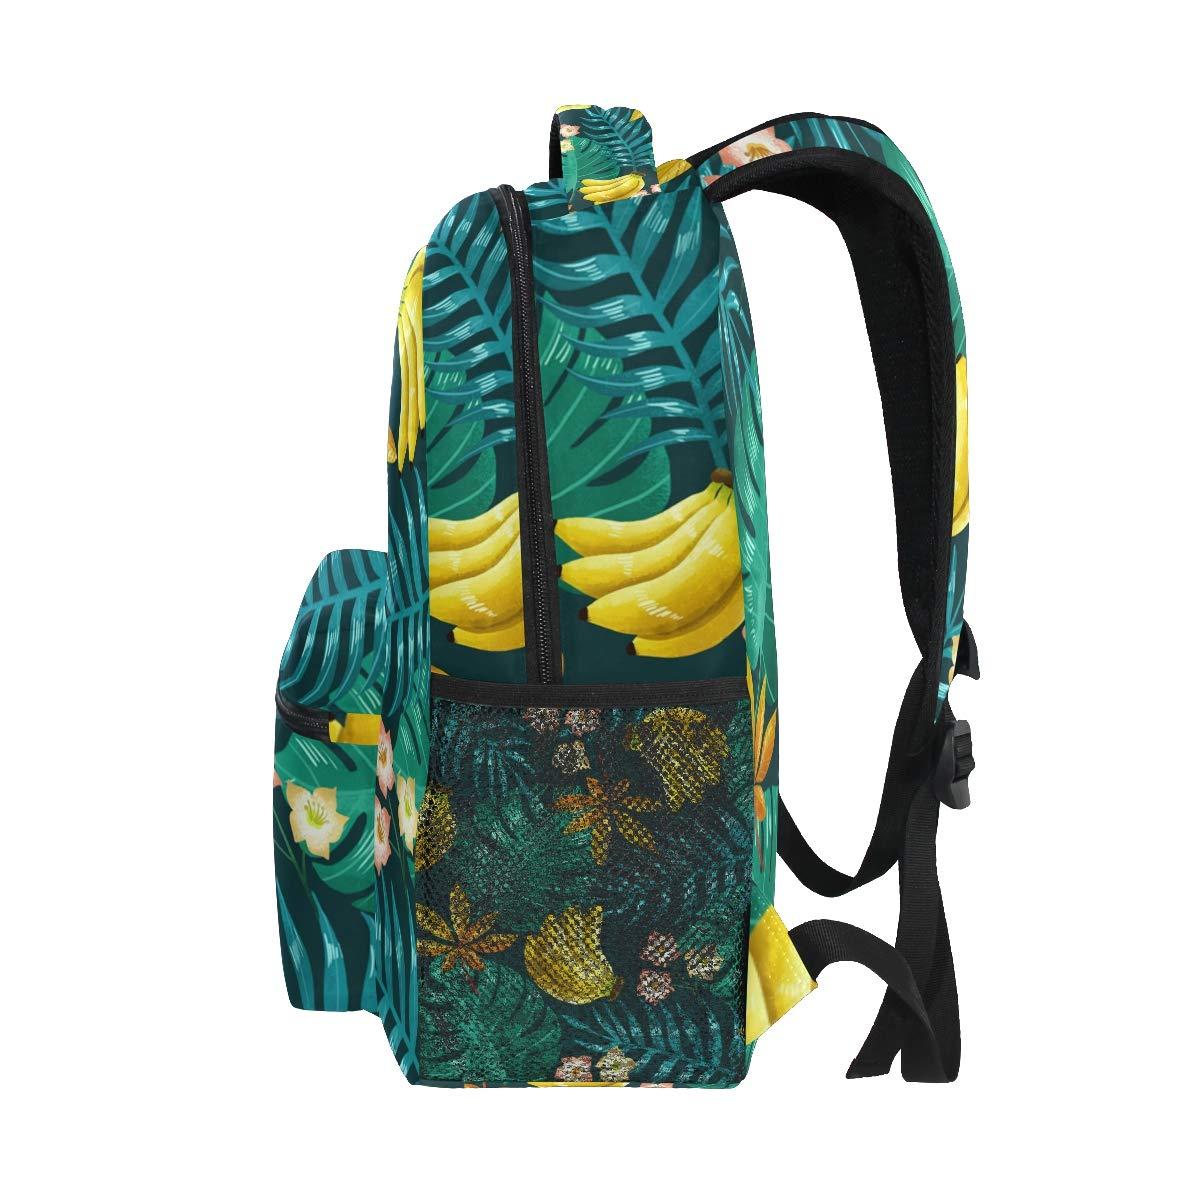 Pink Pineapple Backpack School Bag Travel Rucksack for Students Girls